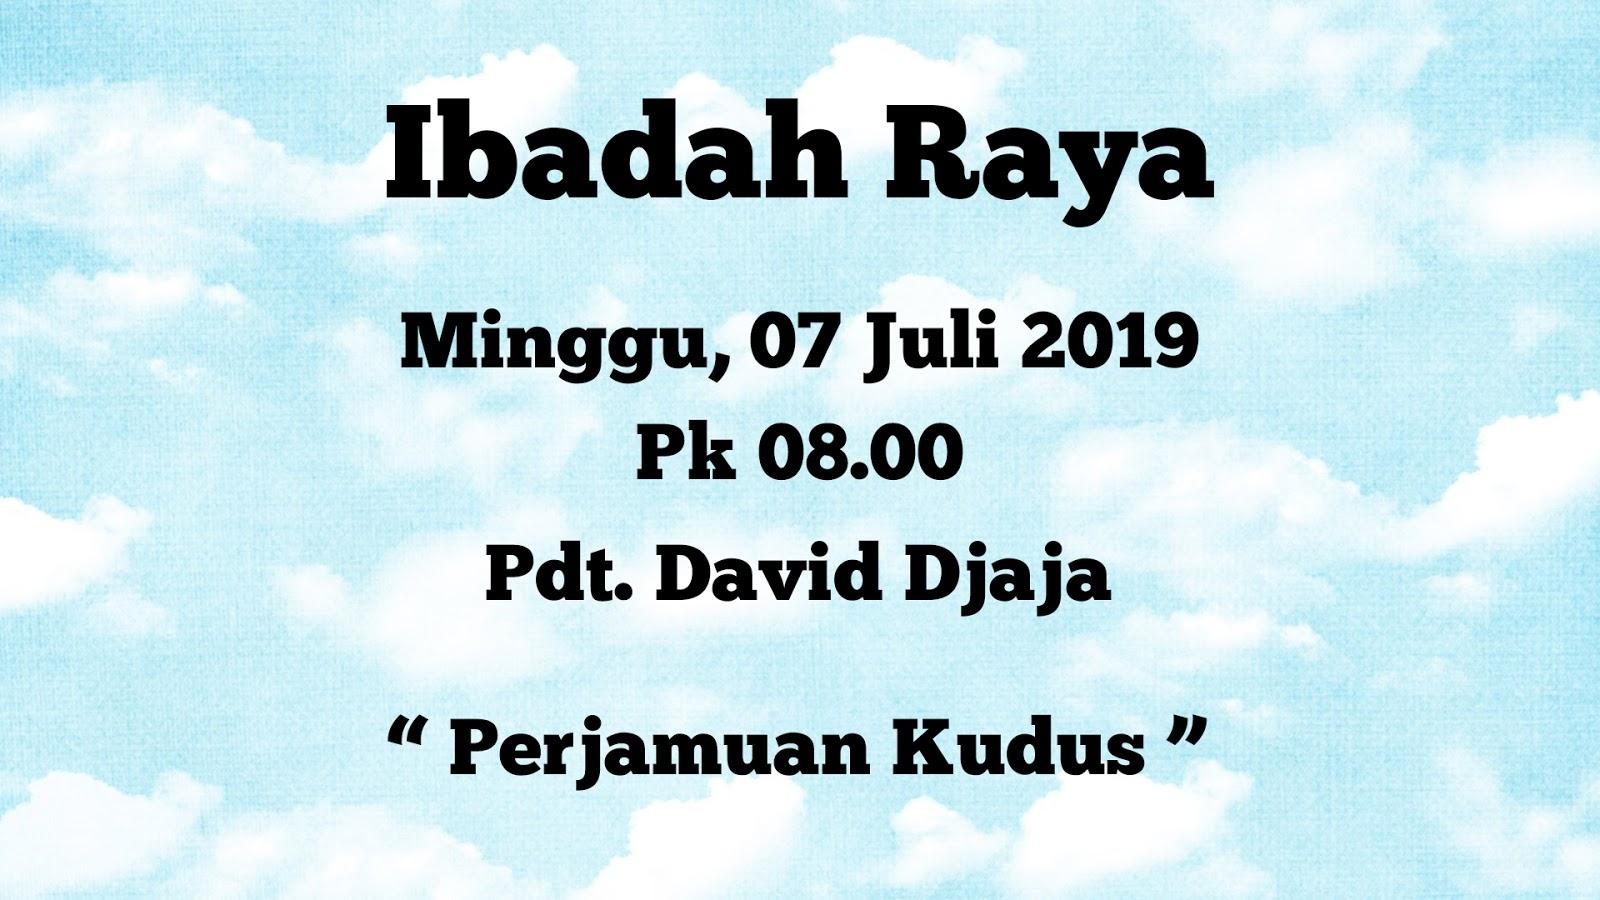 Ibadah raya GSJA Sword 07-07-2019 Pdt. David Djaja